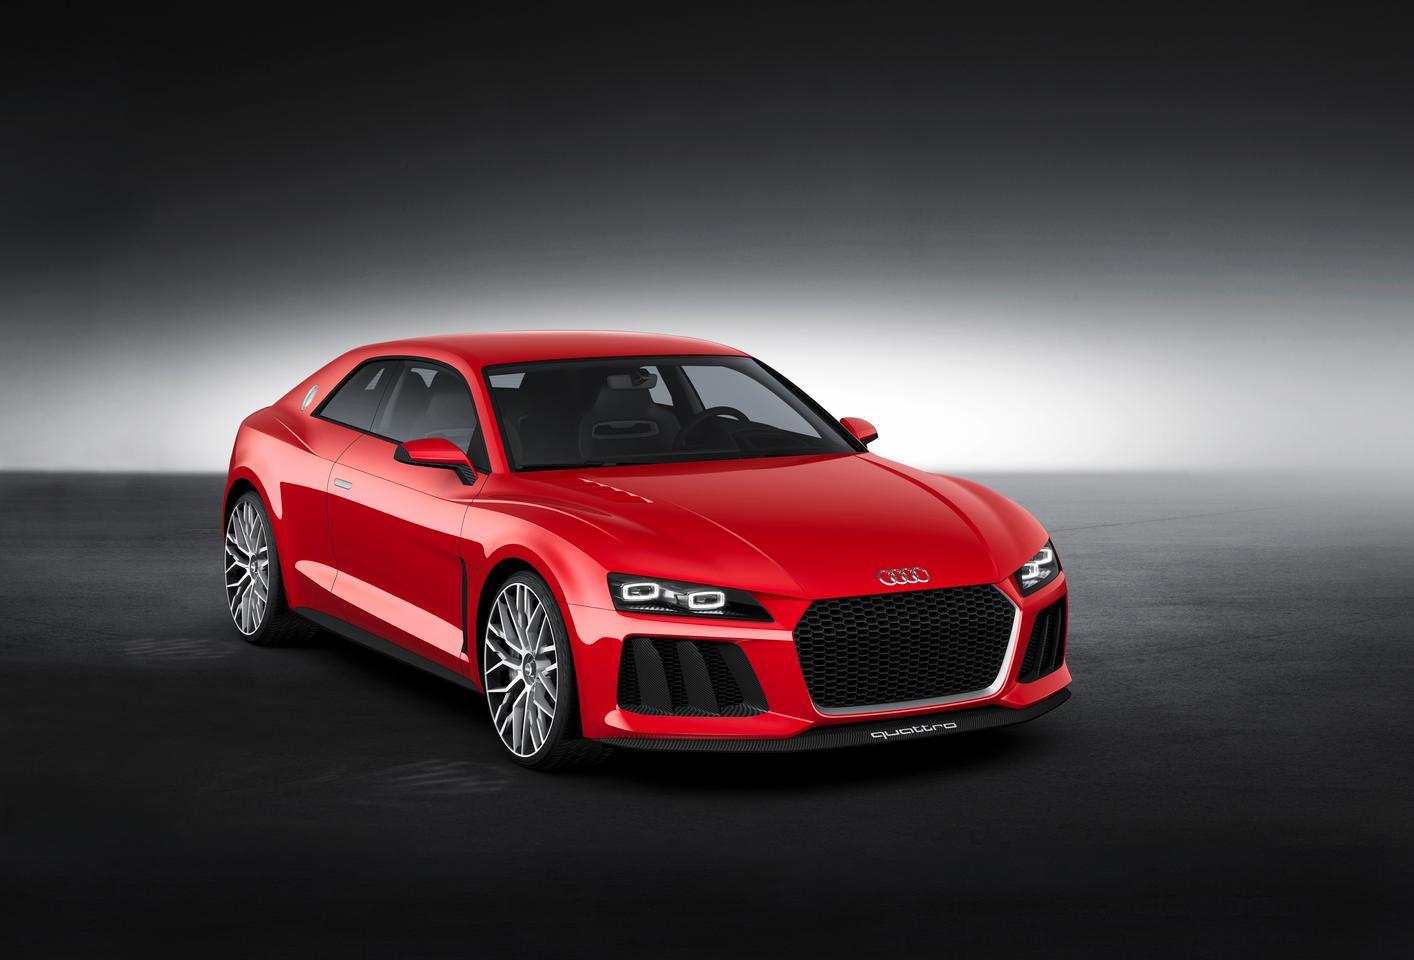 The Sport Quattro Laserlight concept showcases Audi's new design vocabulary